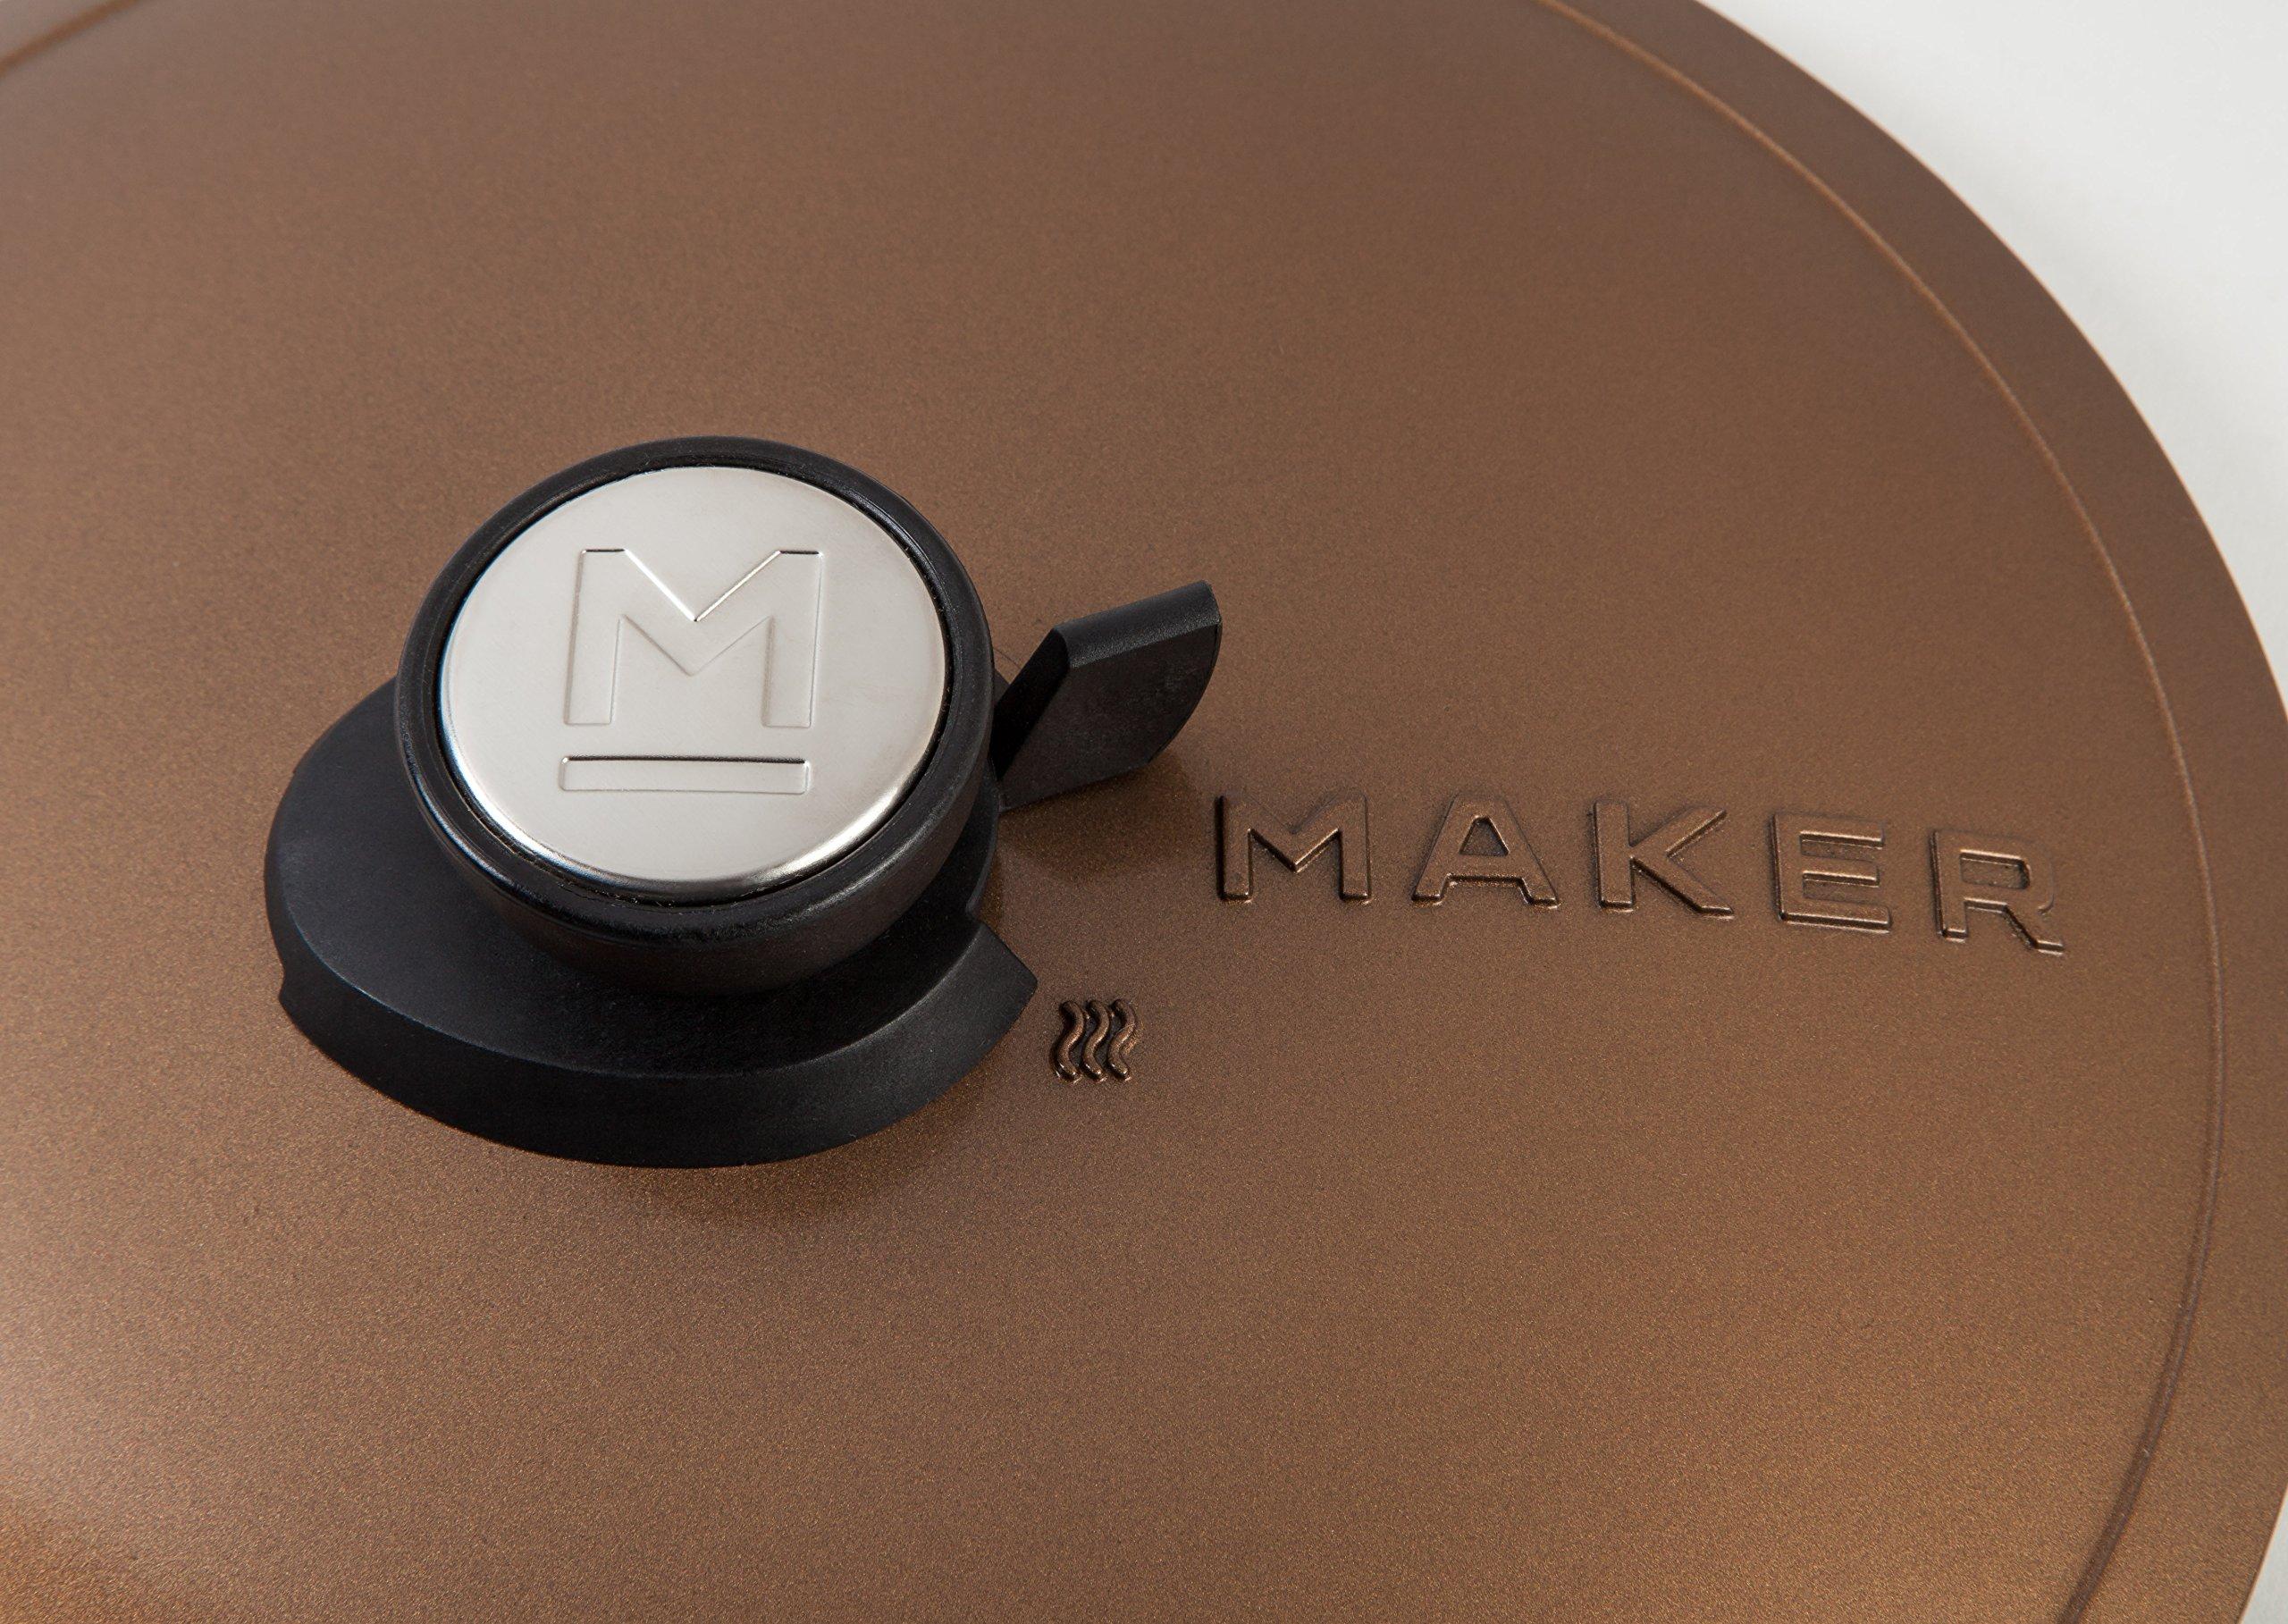 MAKER Homeware 3 QT Cast Aluminum Dutch Oven with Nonstick Ceramic Coating, Bronze by IRIS USA, Inc. (Image #4)